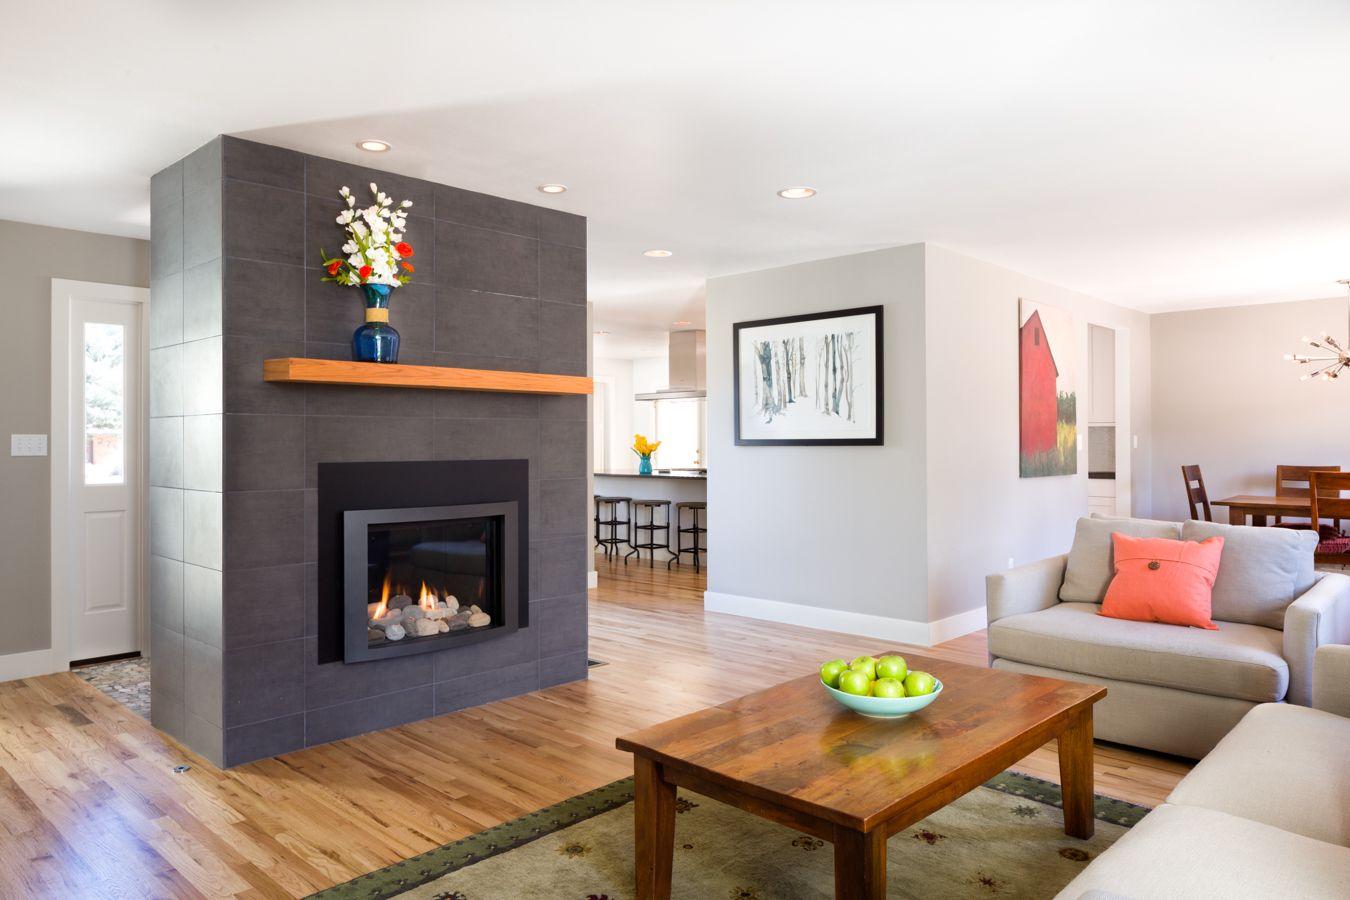 Contemporary Ranch - Living Room Overall - Melton Design ...